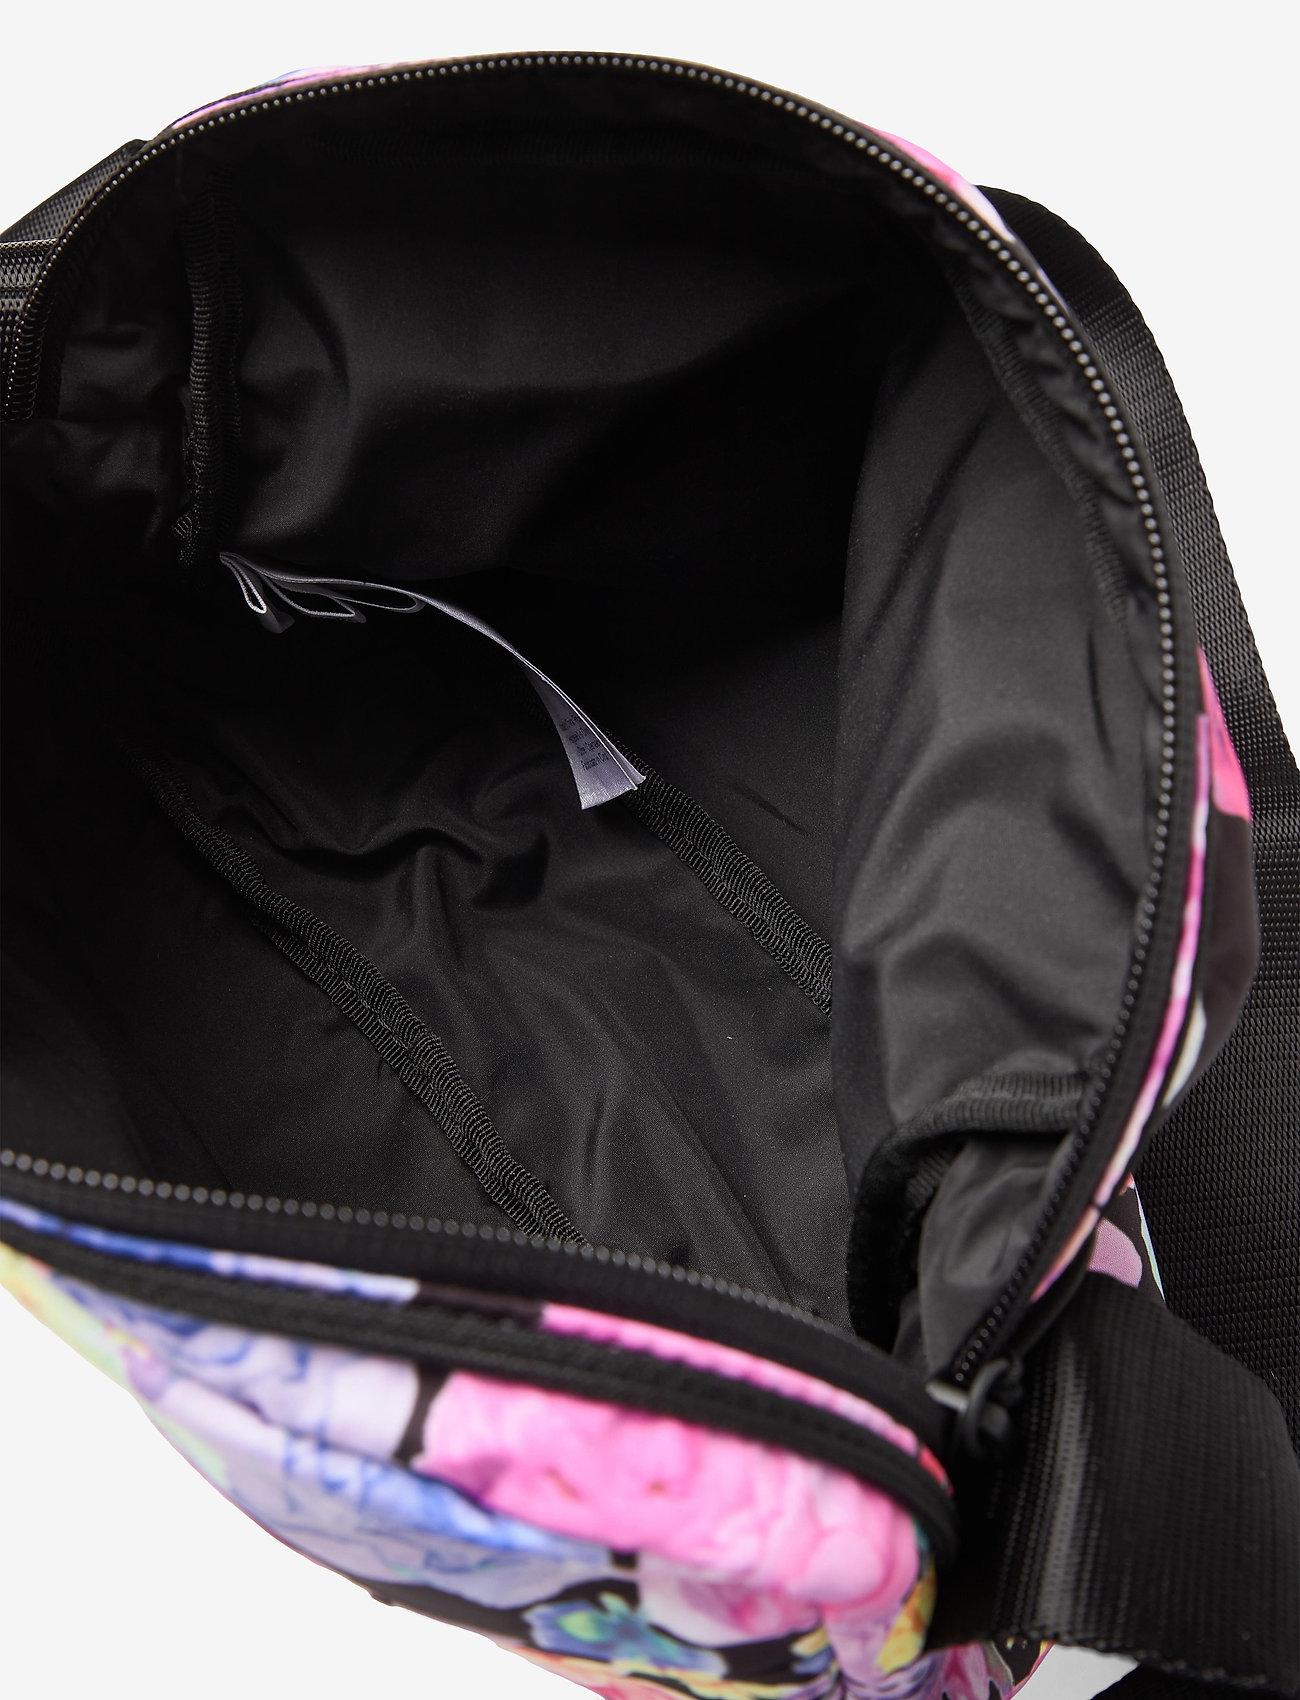 Ganni - Seasonal Recycled Tech Fabric - crossbody bags - multicolour - 4